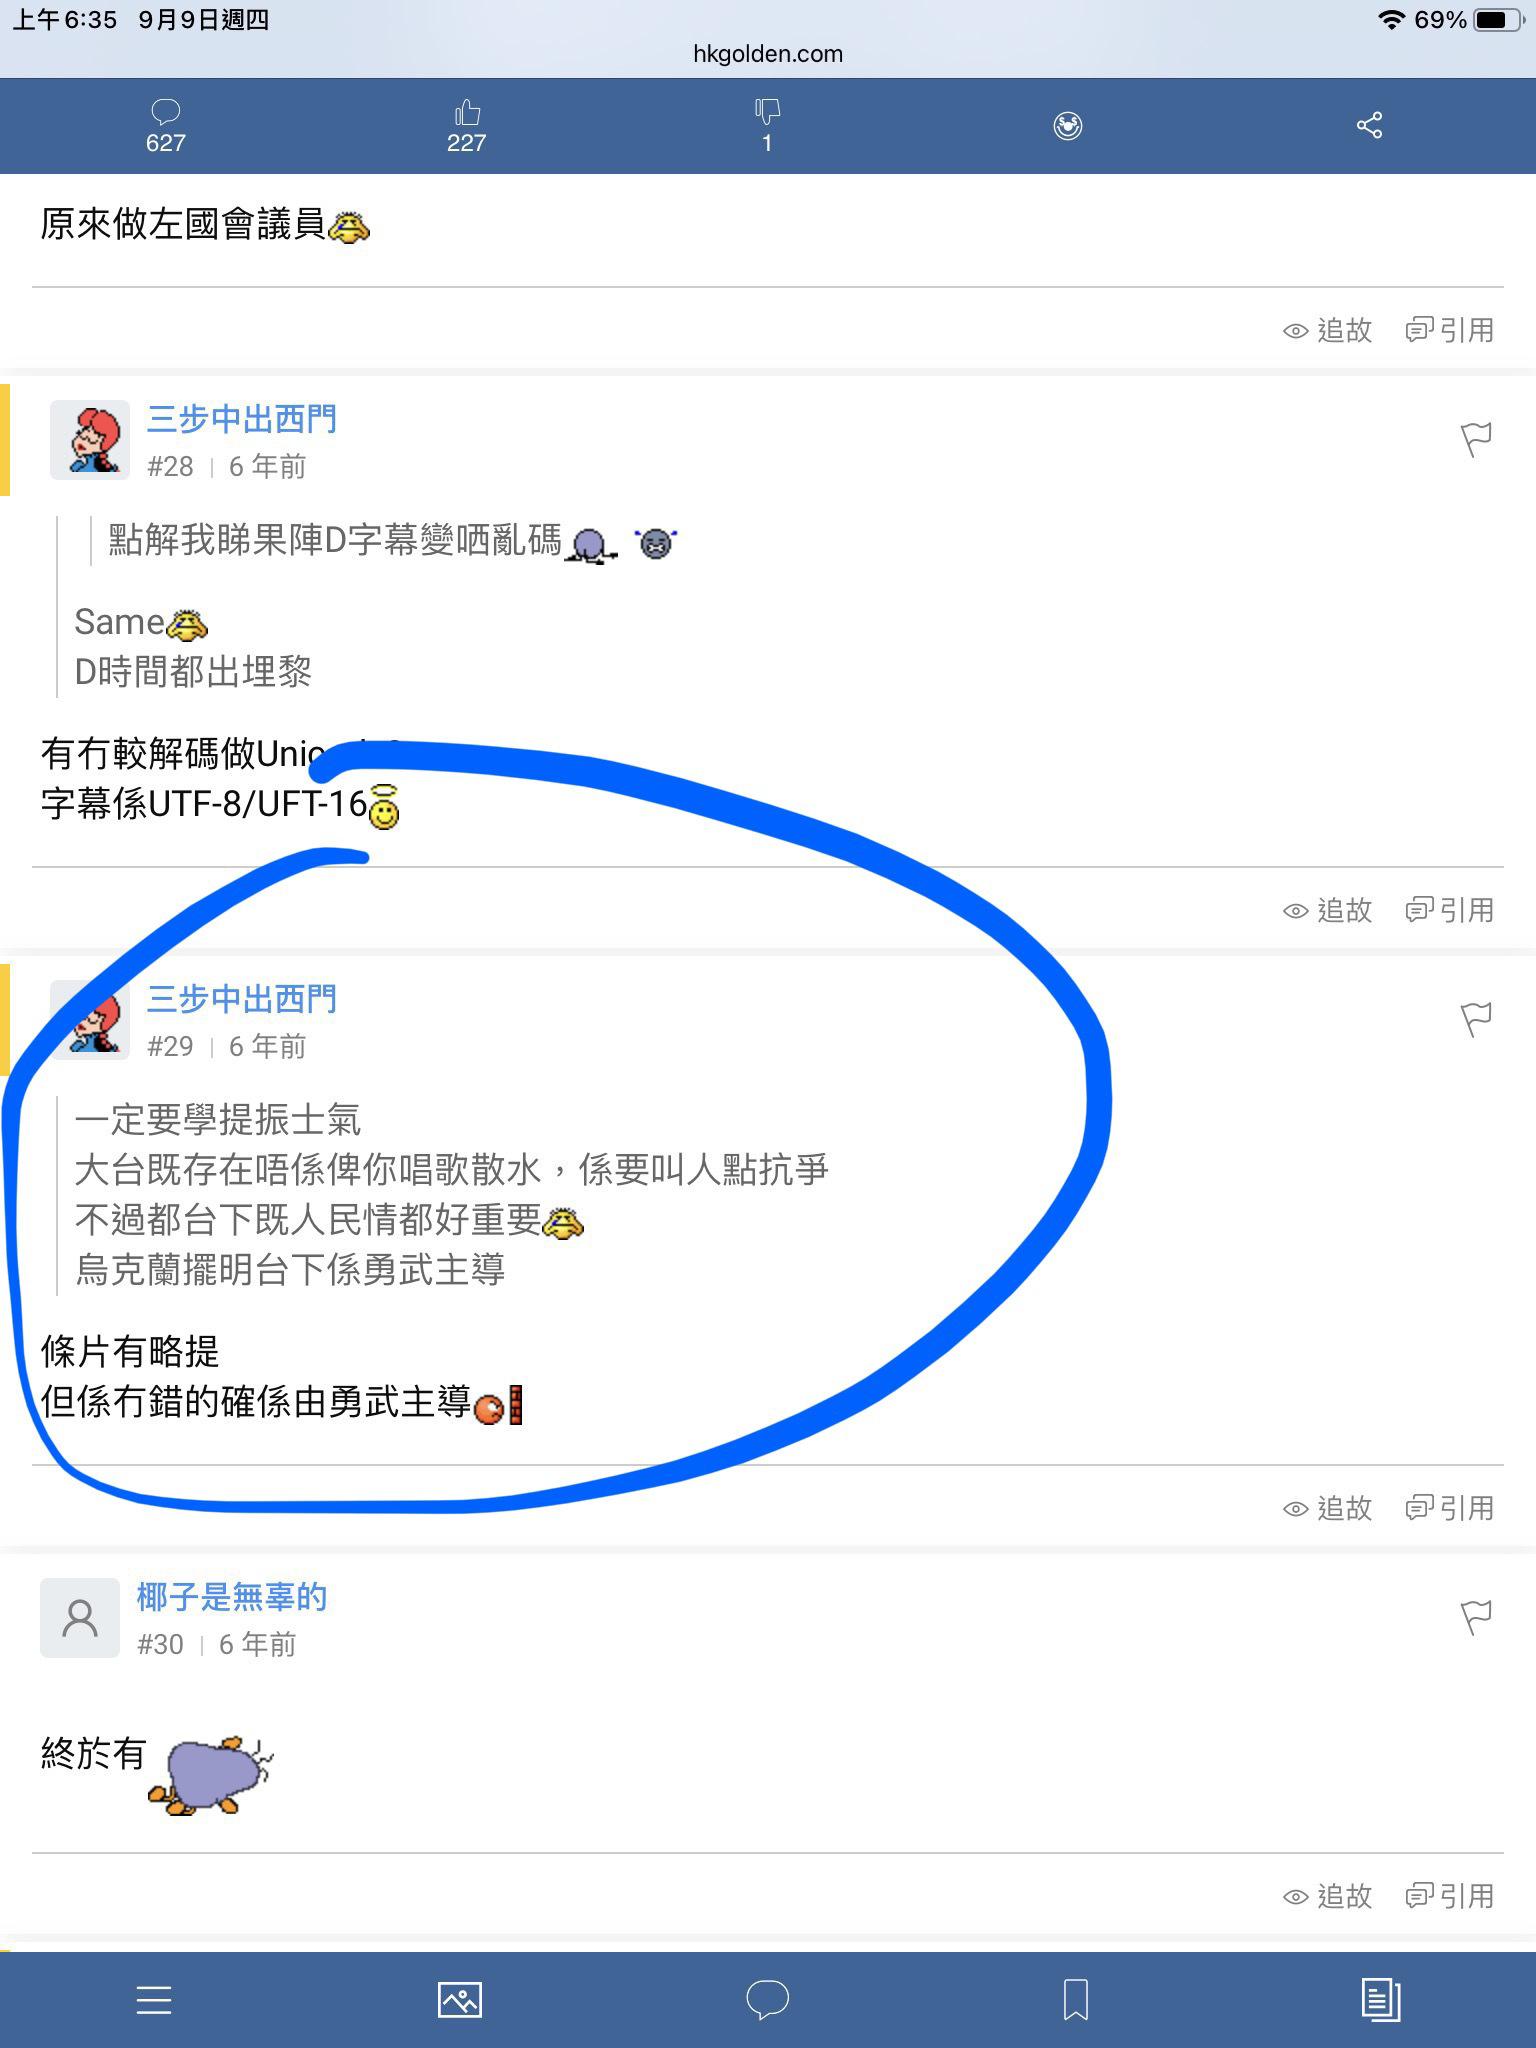 https://upload.hkgolden.media/comment/ooqoxkhm.ctbuwkupn1z.jxhz5grpbqo.11x.jpg